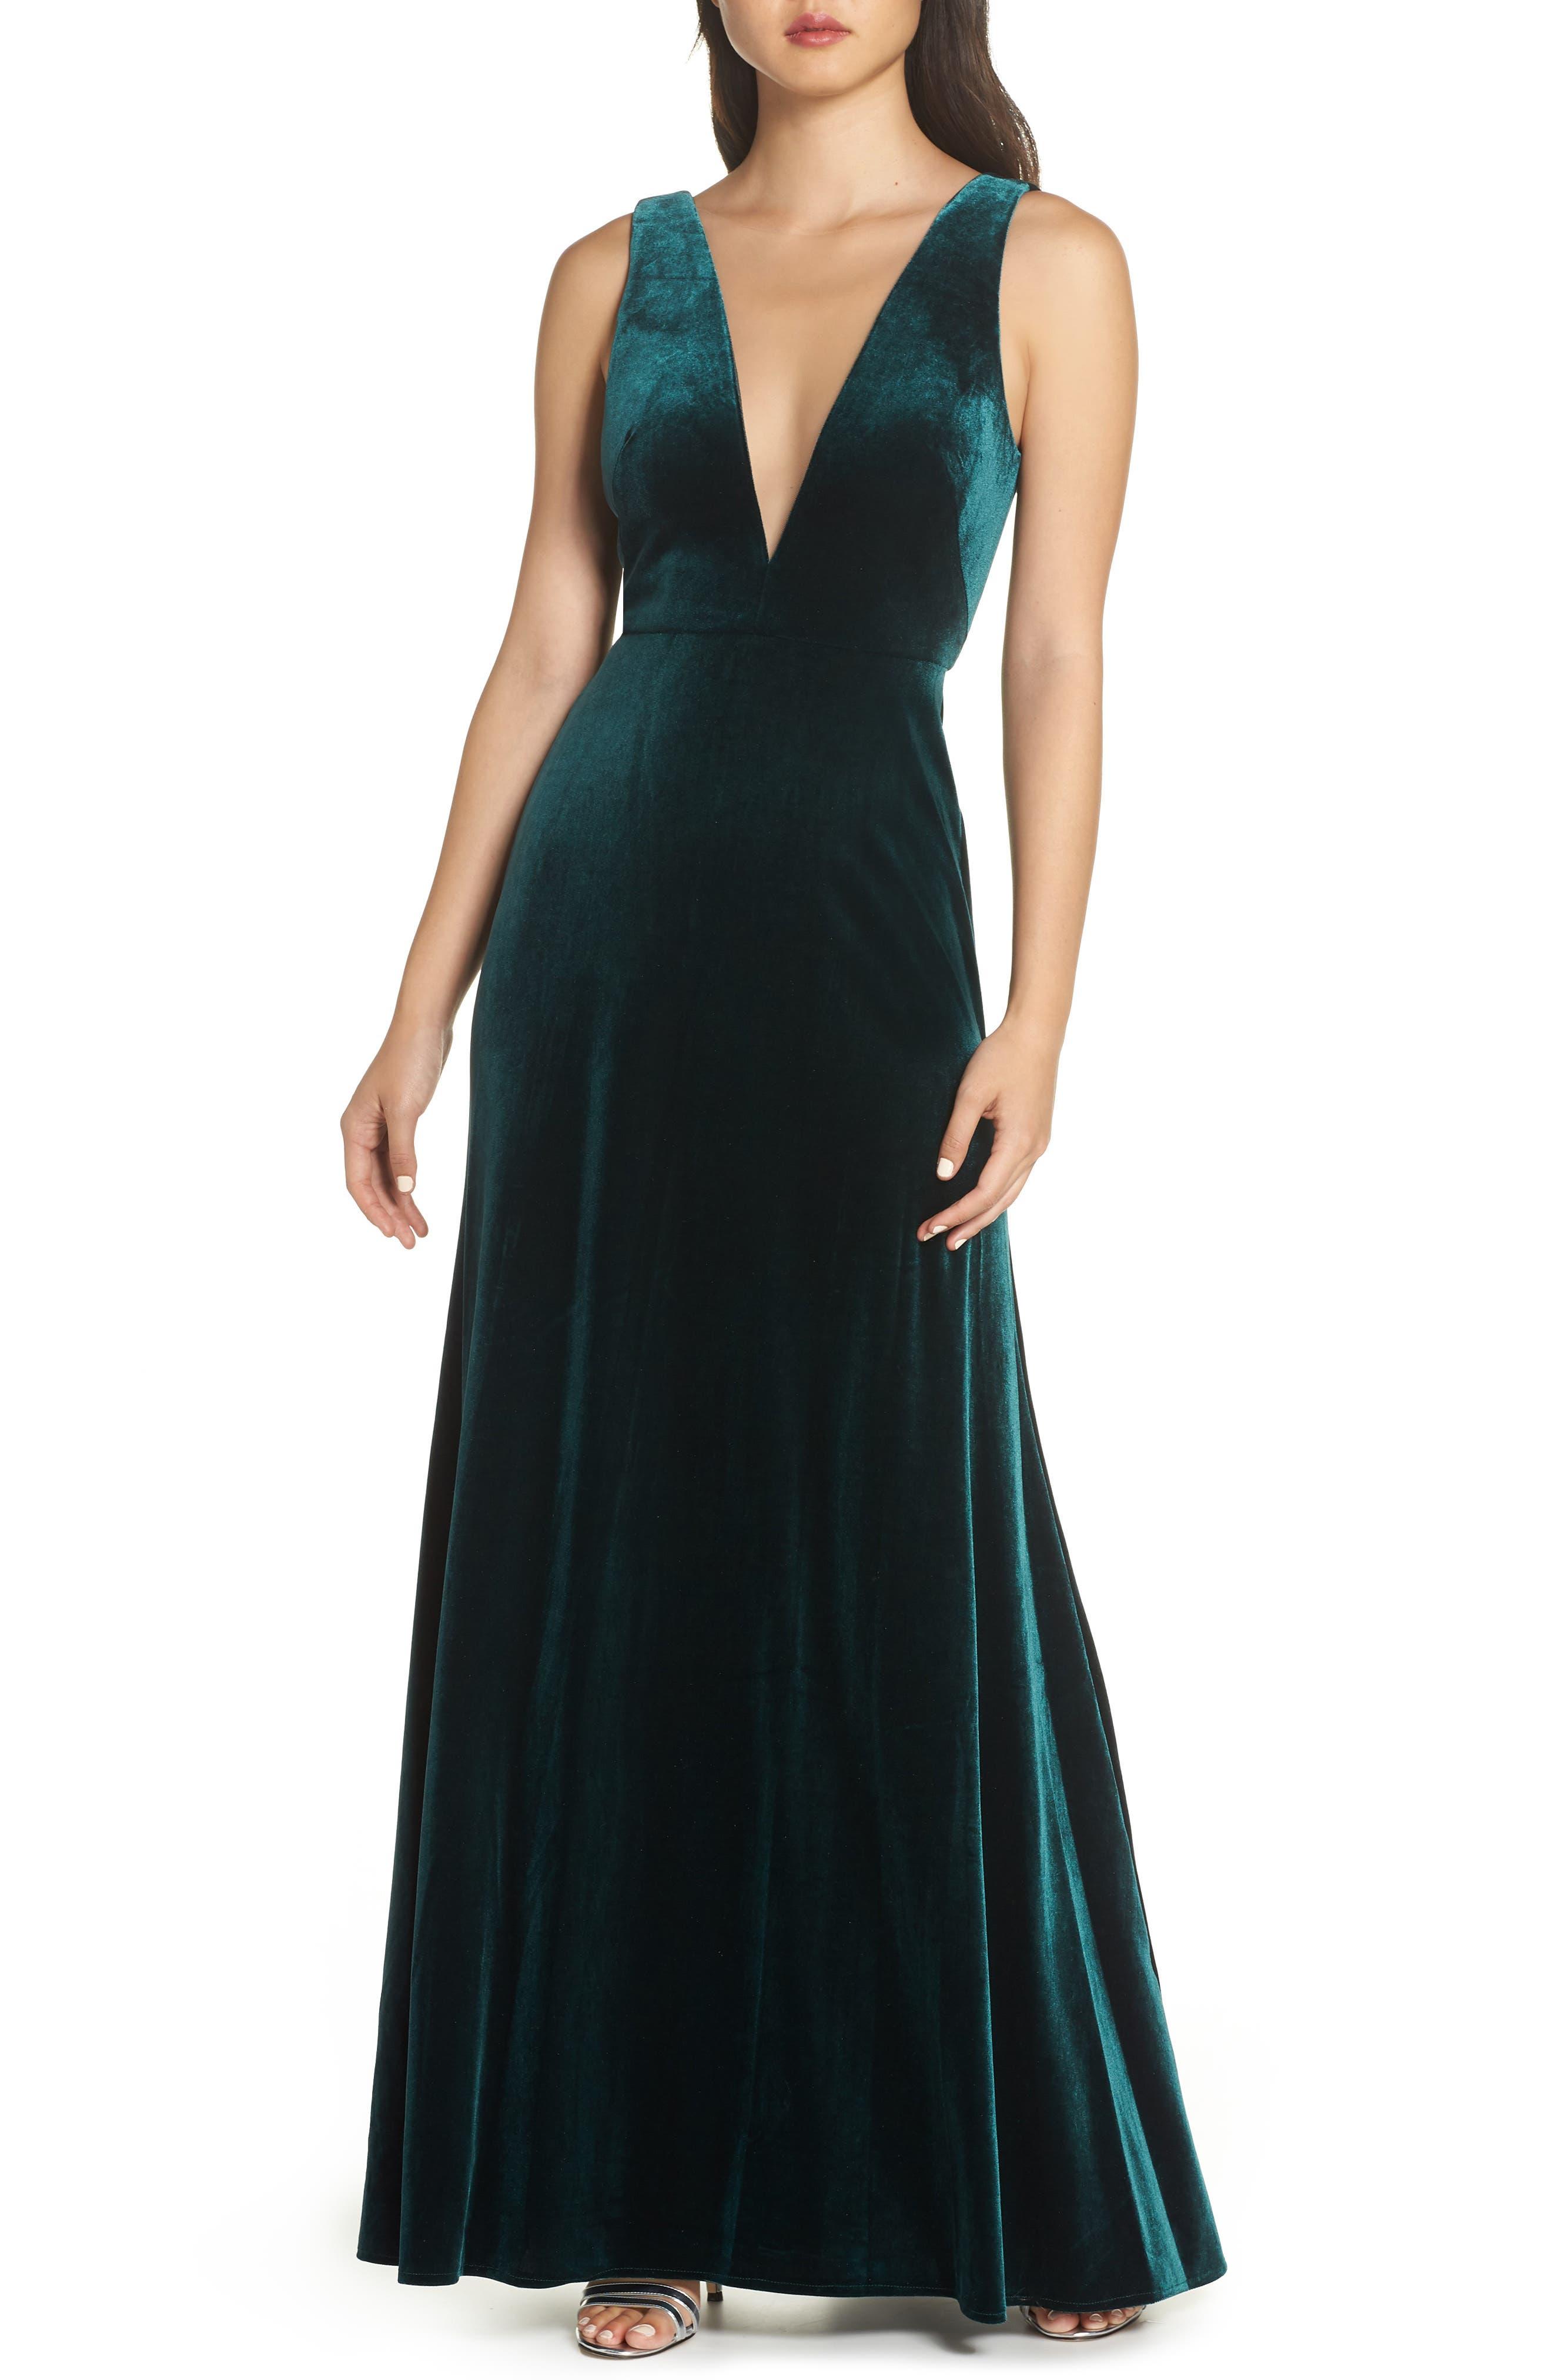 Logan Plunging V-Neck Velvet Gown in Emerald